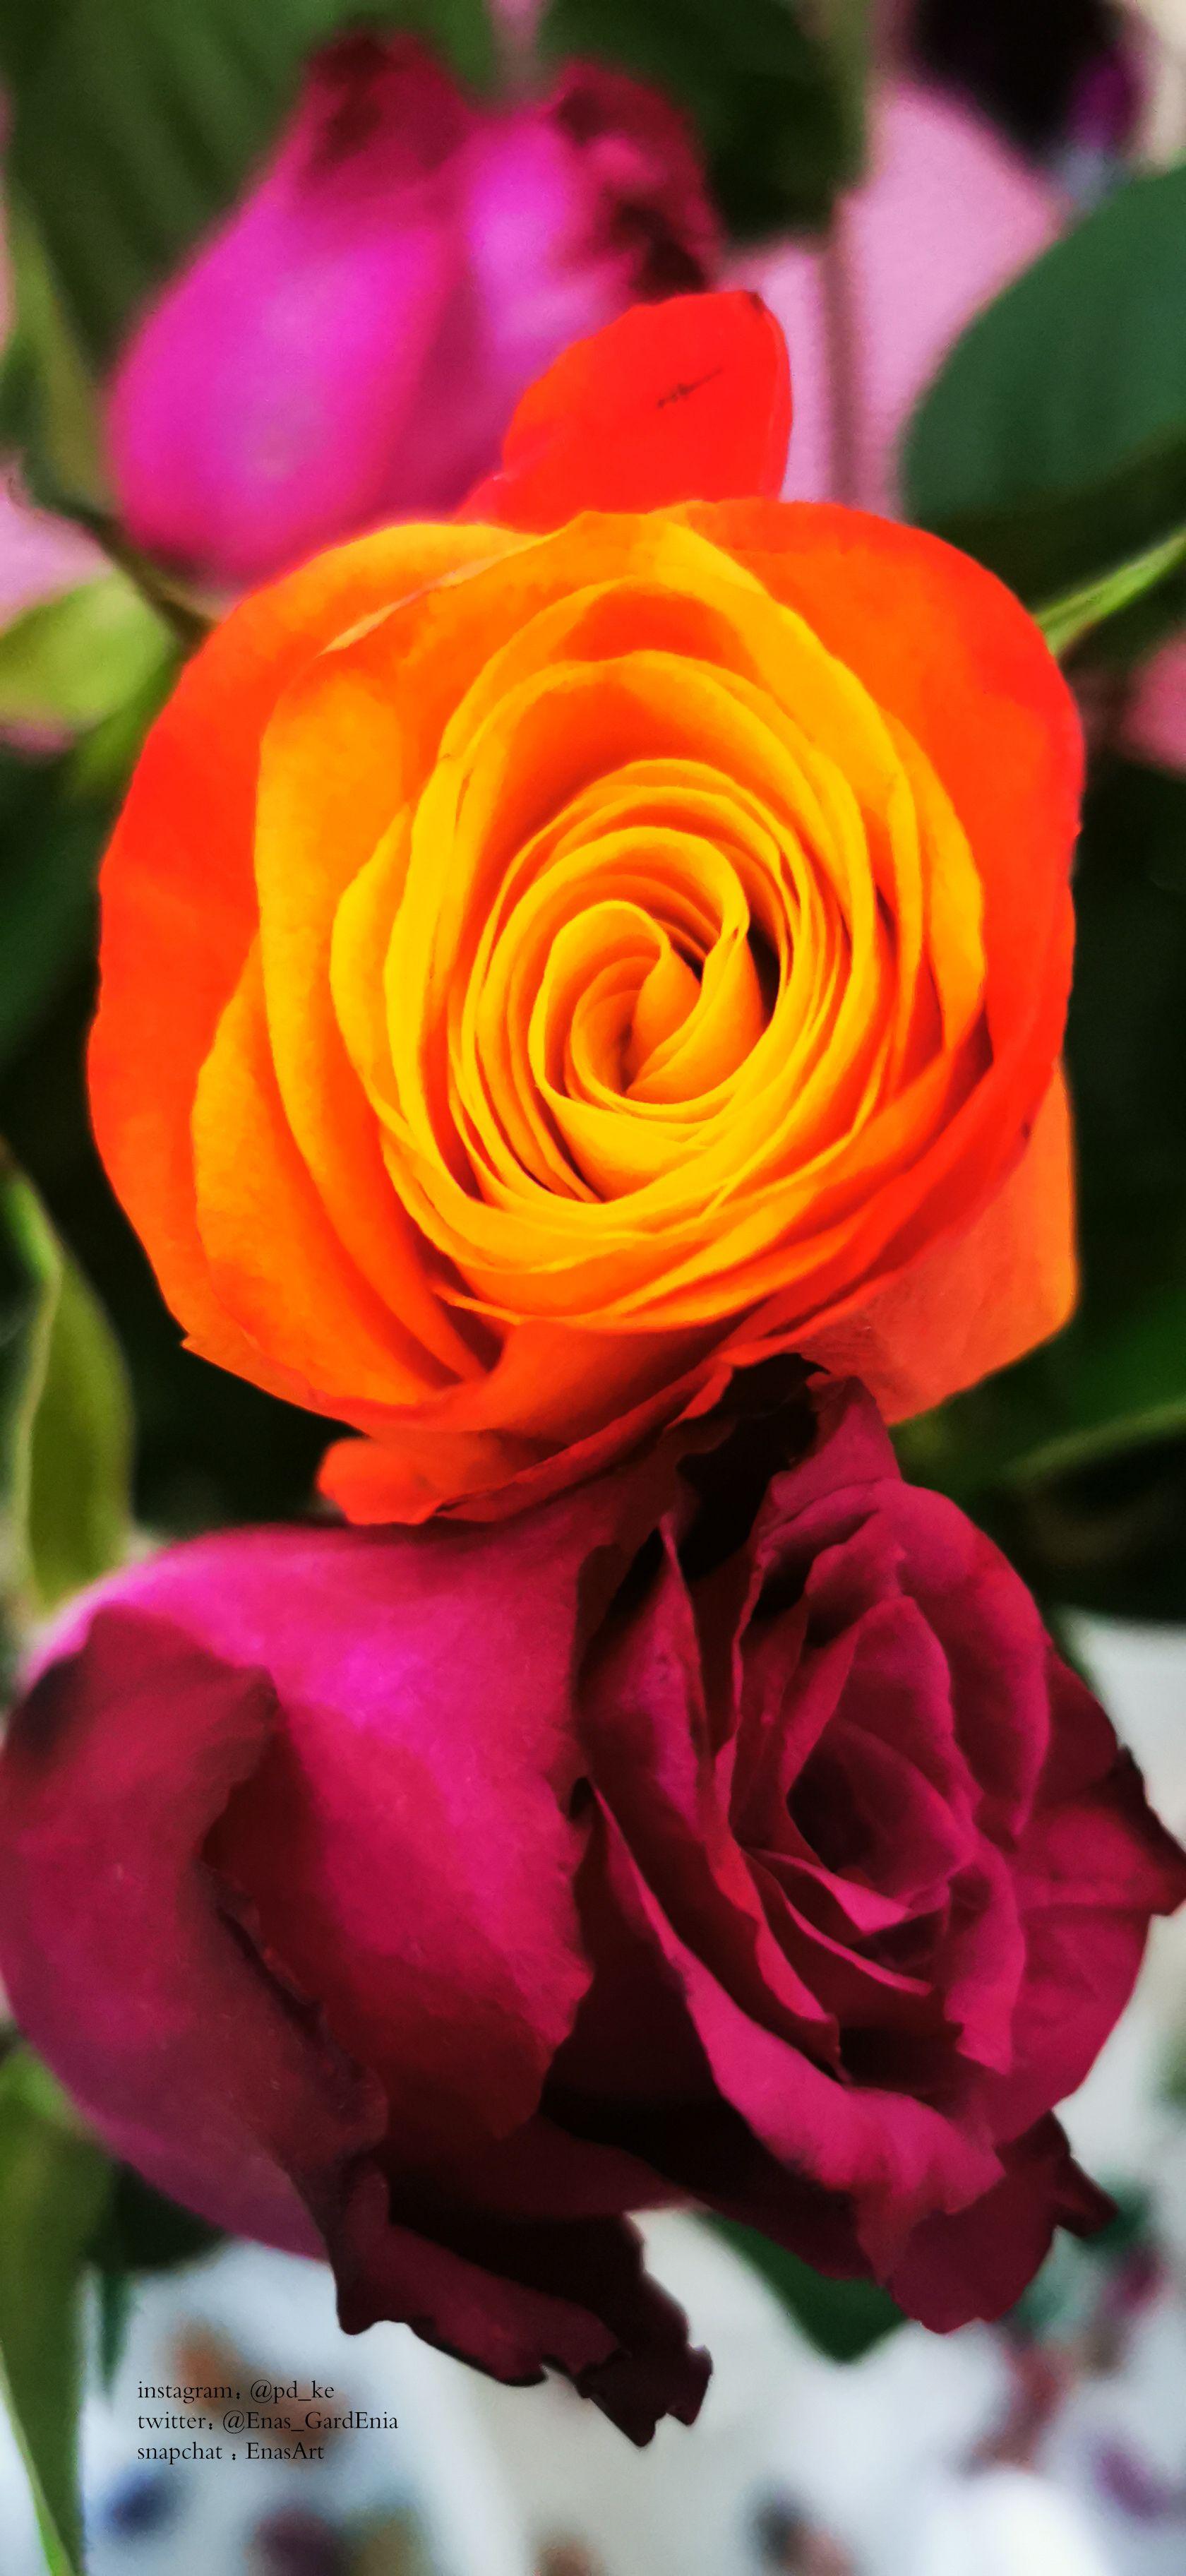 Instagram Pd Ke Twitter Enas Gardenia Snapchat Enasart Www Instagram Com Pd Ke تصويري ايناس الغاردينيا تصوير جوال تصوير السعود In 2020 Flowers Rose Plants